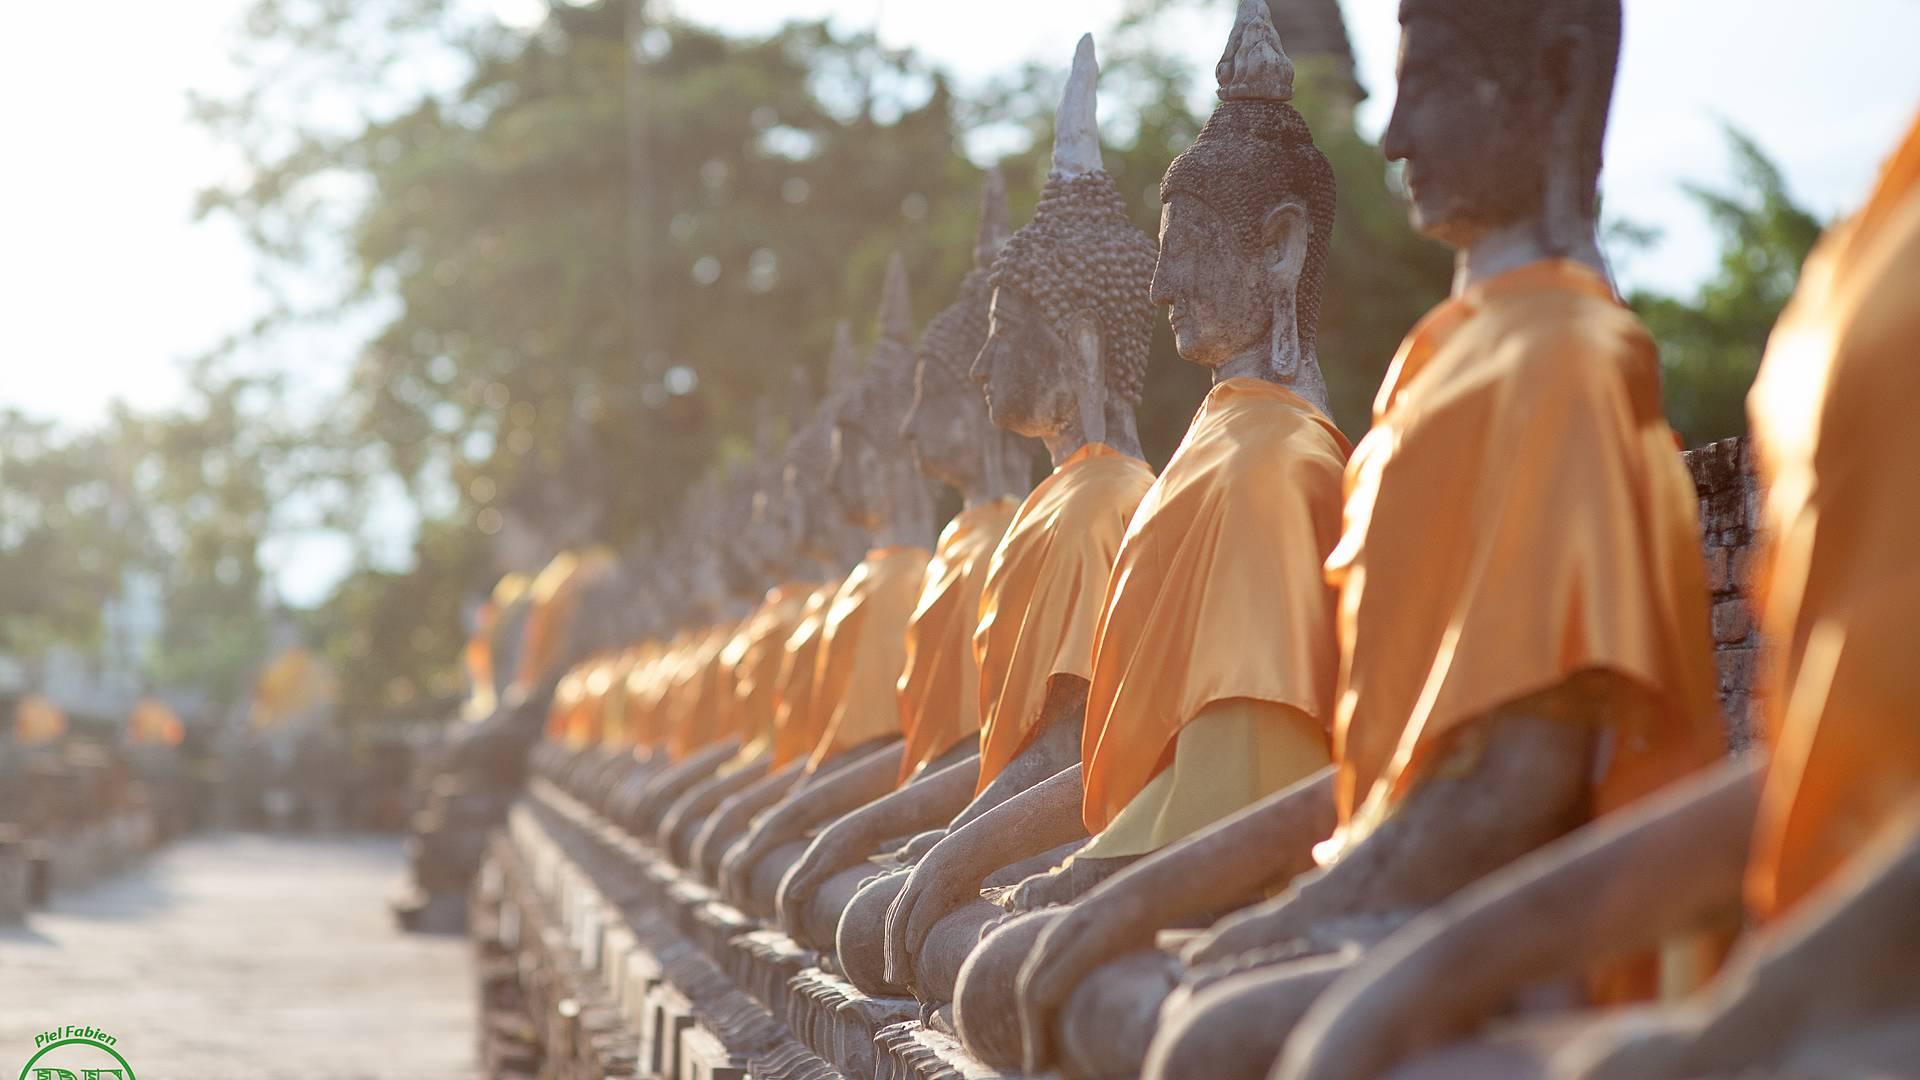 Couleurs thaïes de Bangkok à Koh Samet